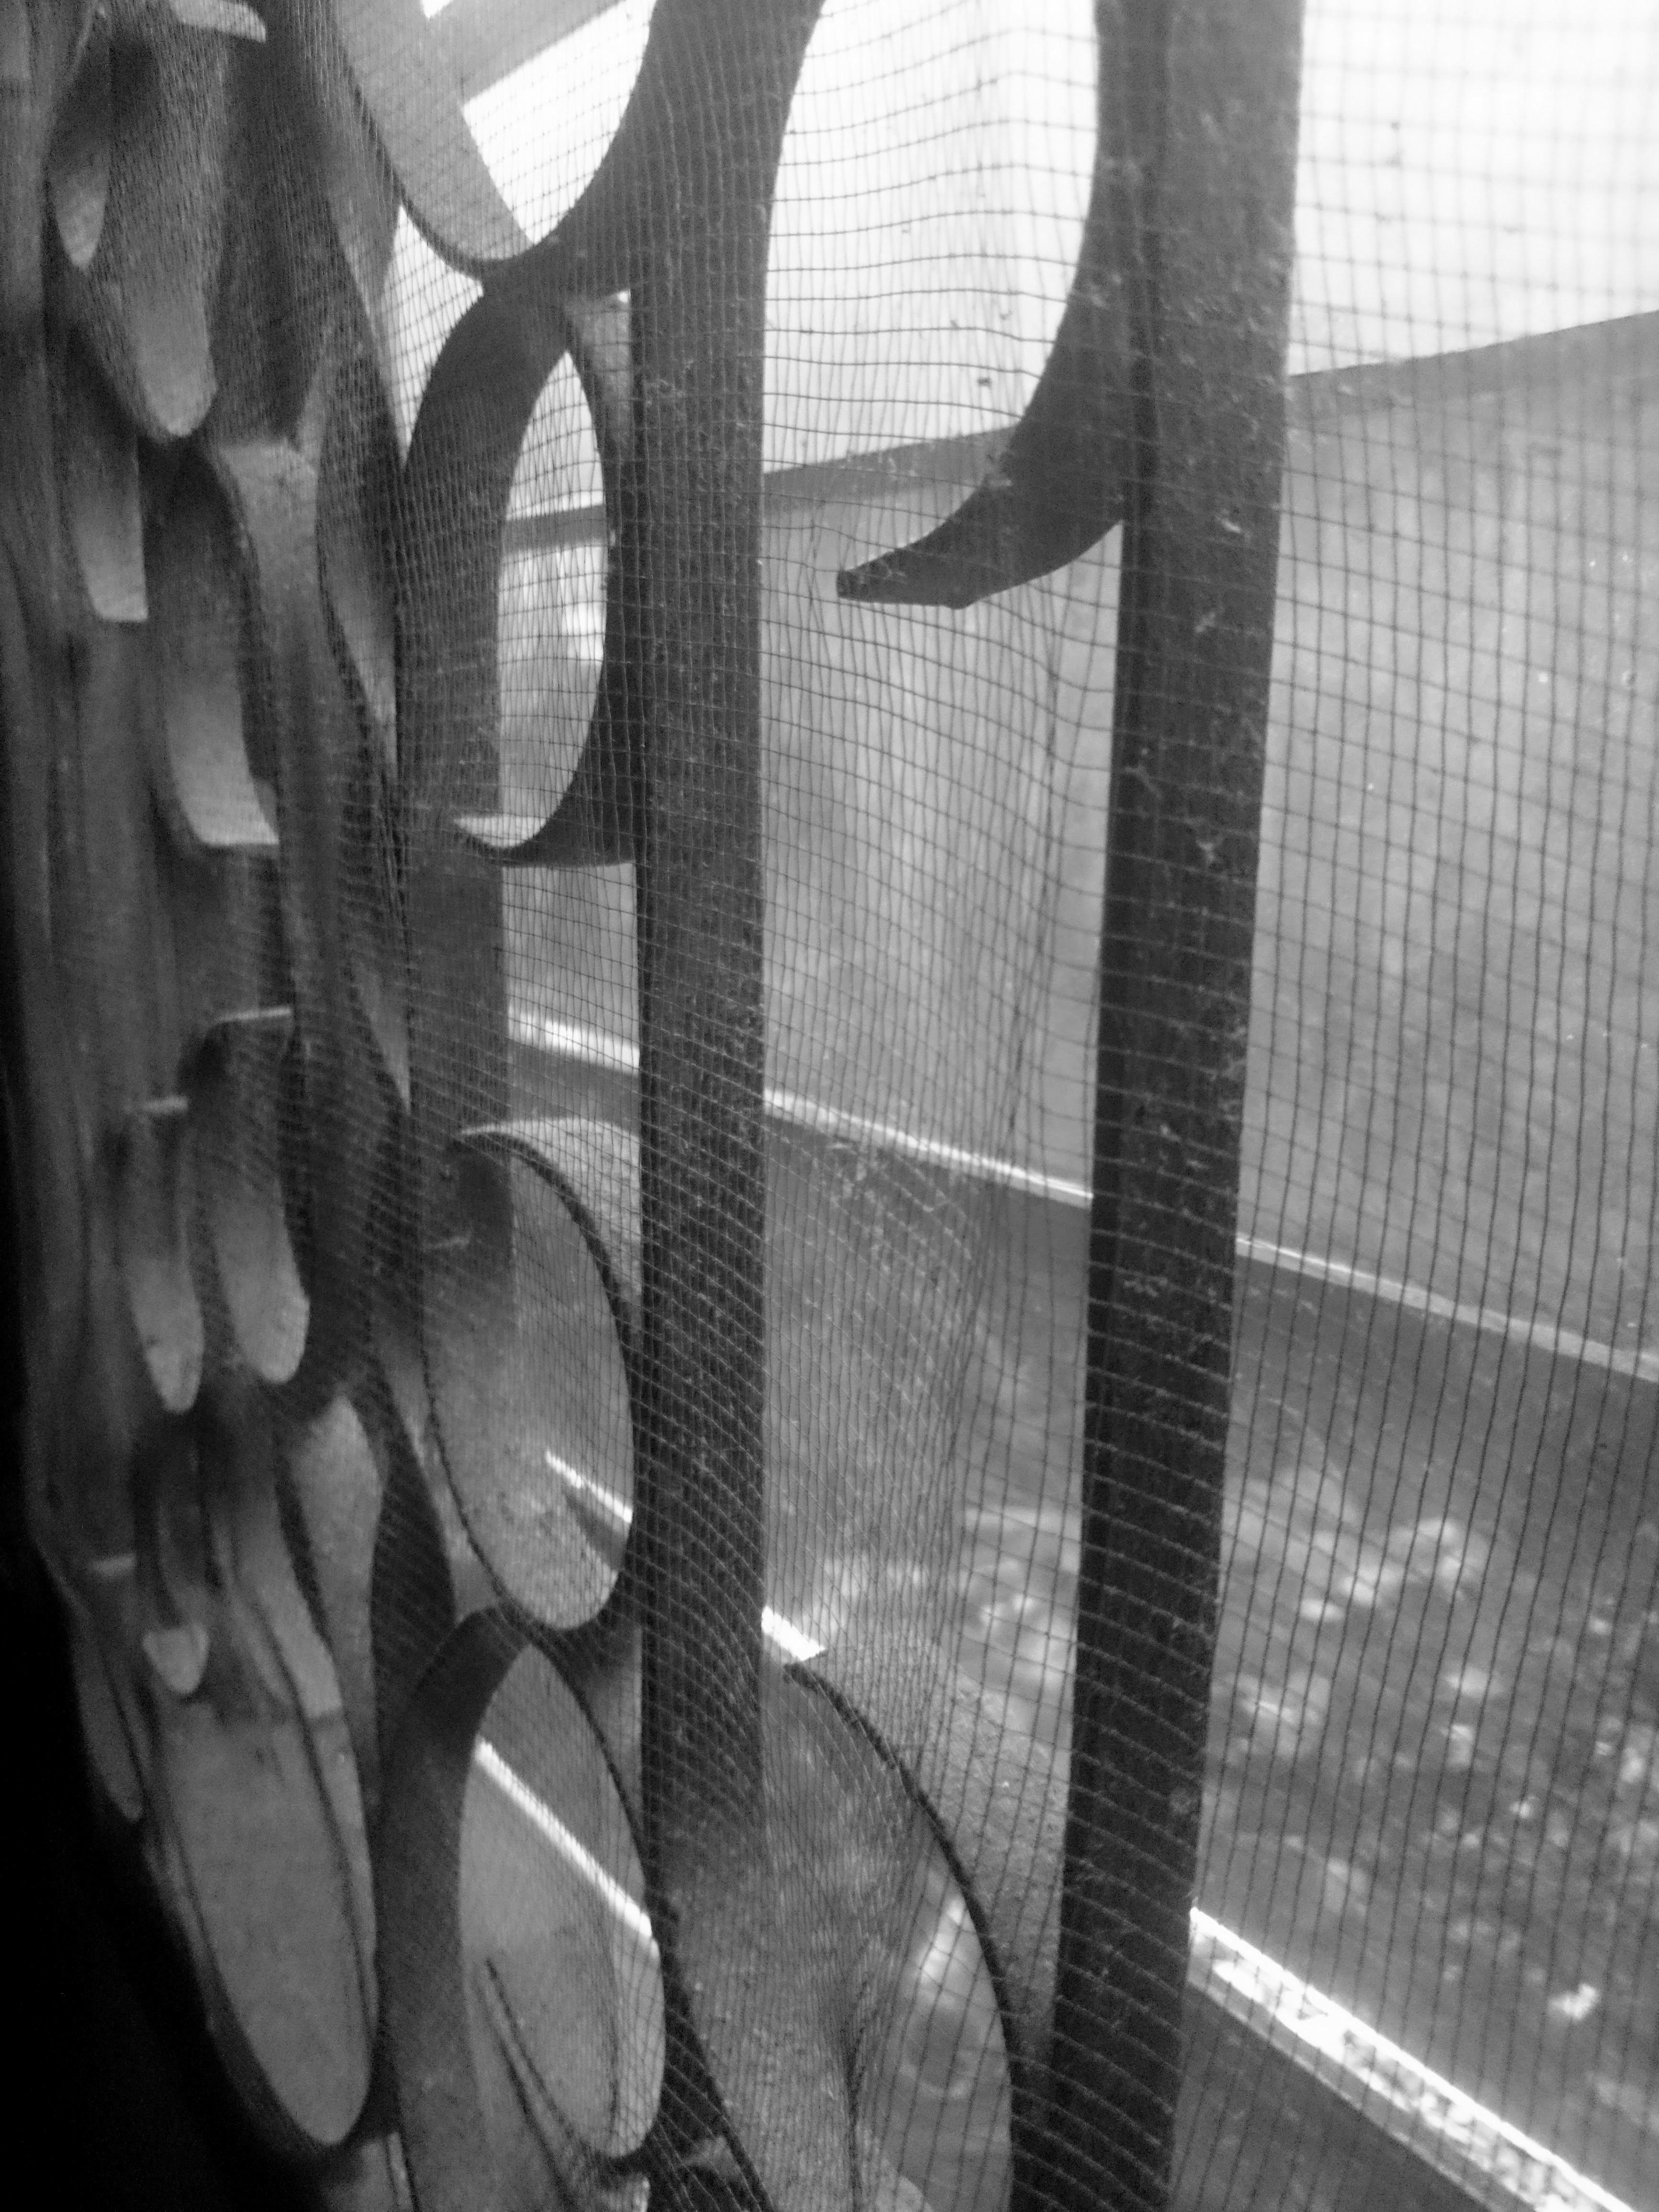 Old style window photo